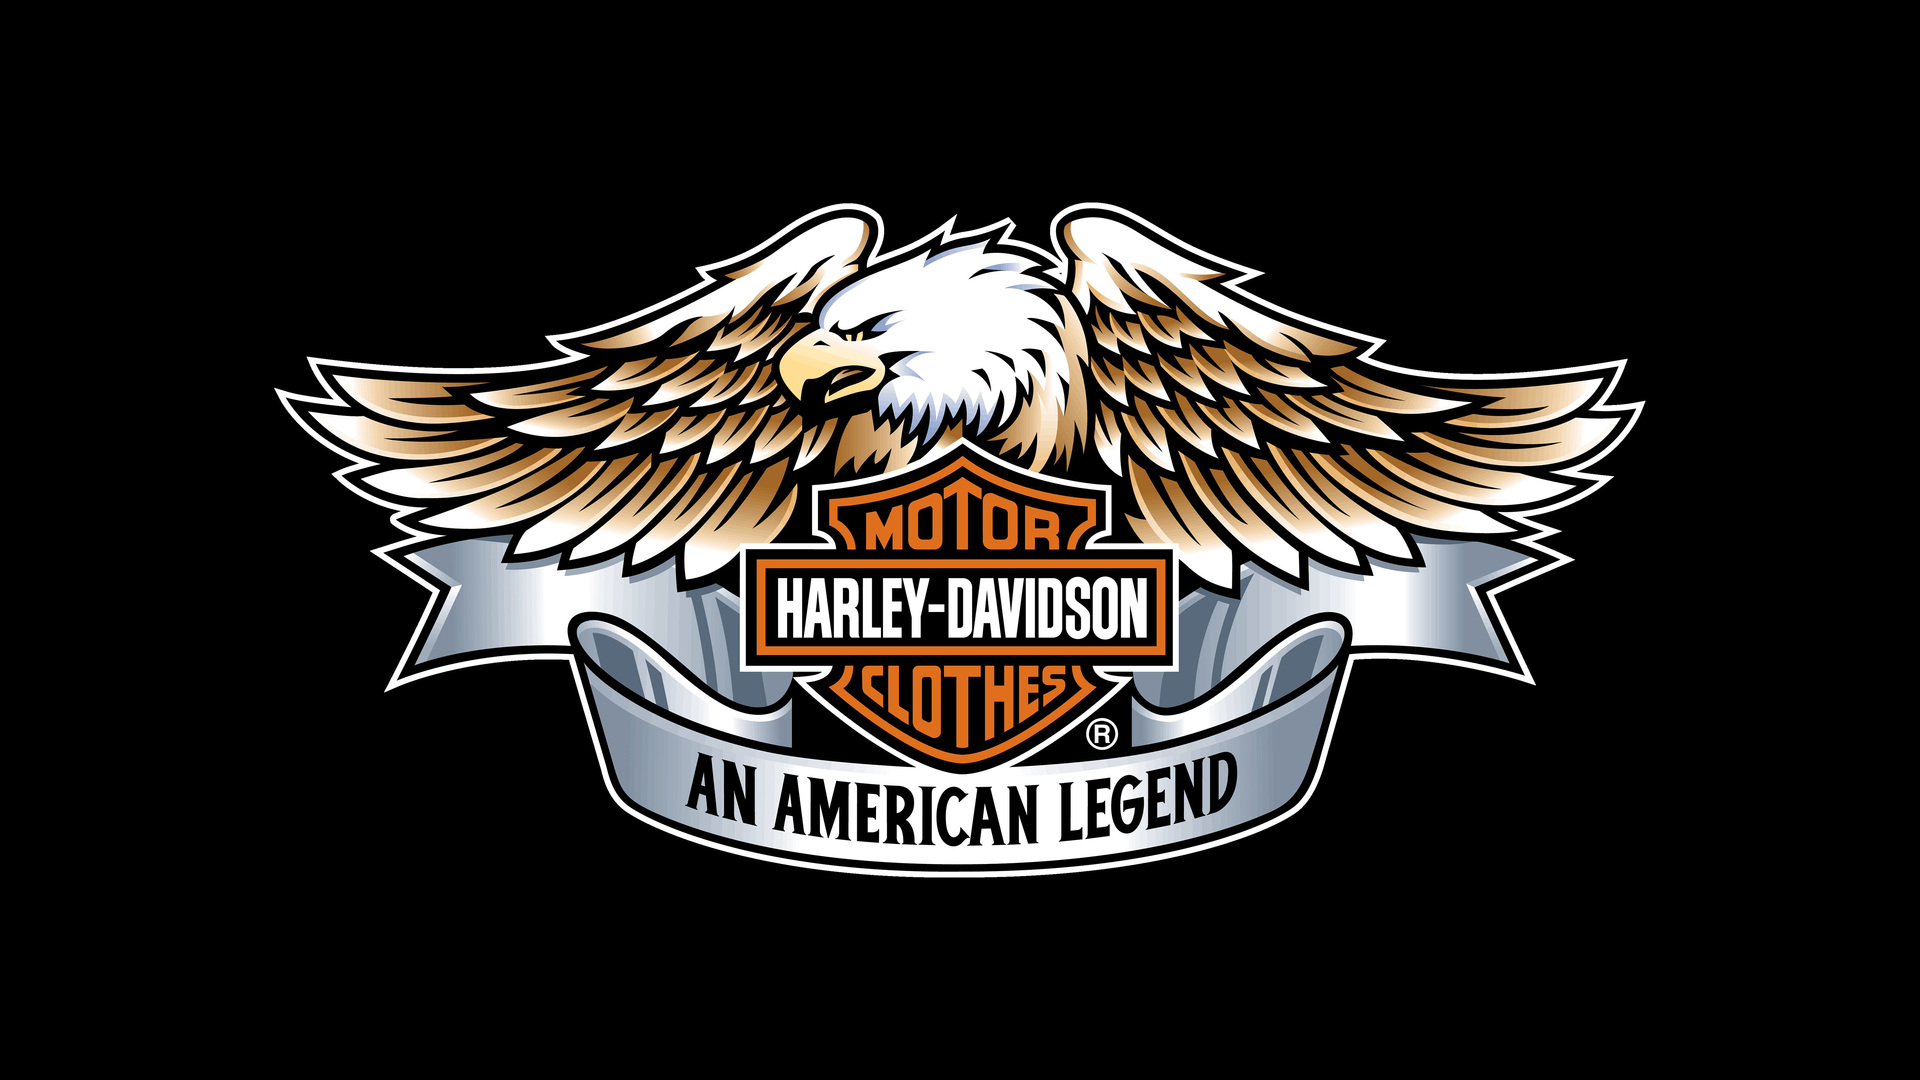 1920x1080 Harley Davidson Eagle Logo 4k Laptop Full HD ...